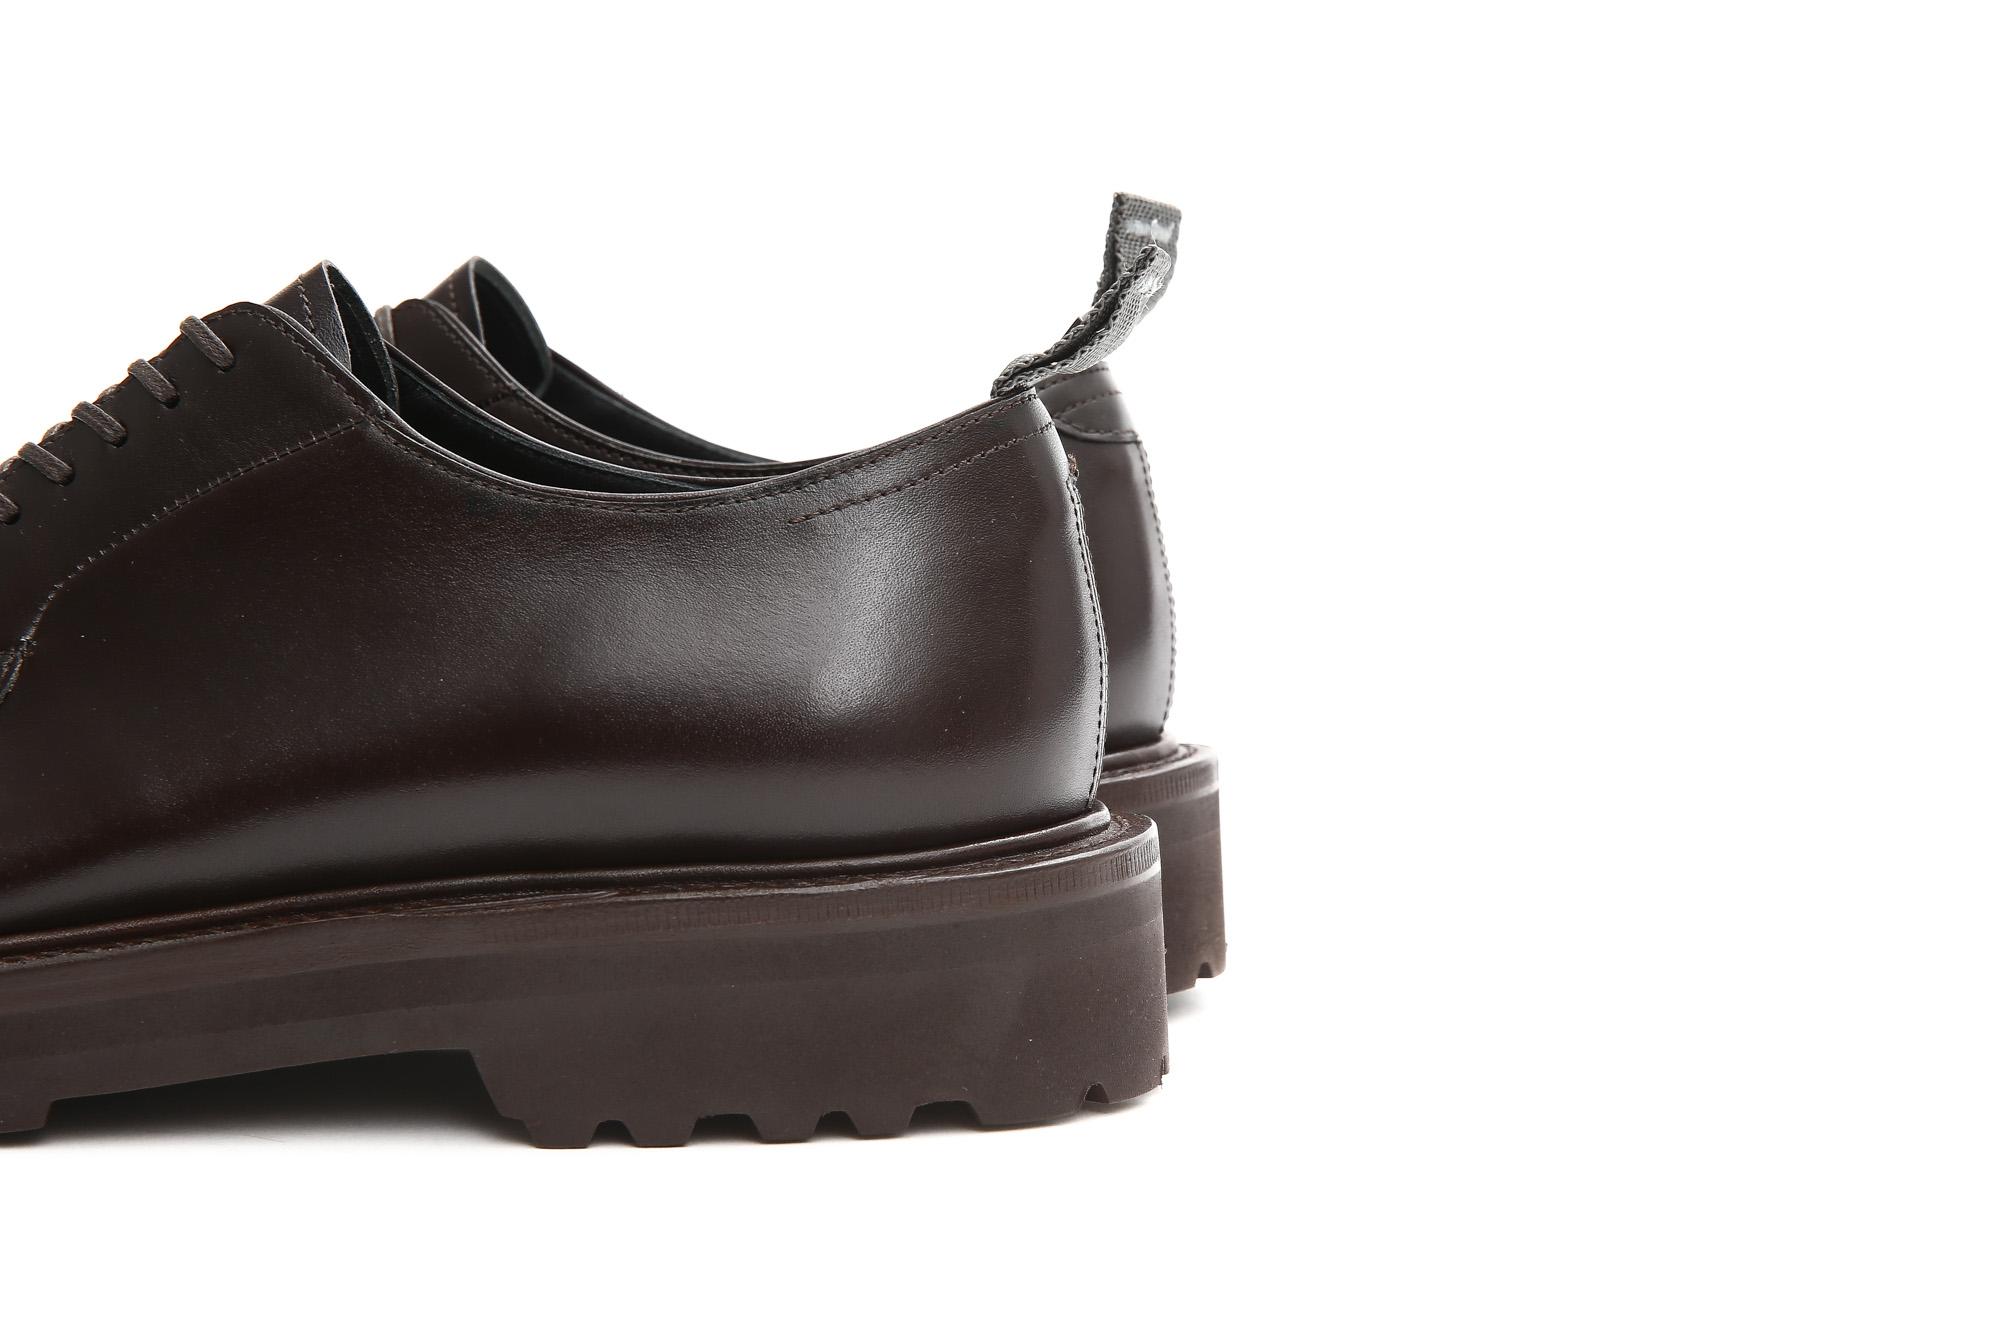 【WH / ダブルエイチ】 【WH-0001(WHS-0001)】 Plane Toe Shoes (干場氏 スペシャル モデル) Cruise Last (クルーズラスト) ANNONAY Vocalou Calf Leather プレーントゥシューズ DARK BROWN (ダークブラウン) MADE IN JAPAN(日本製) 2018 春夏新作   【干場氏、坪内氏の直筆サイン入り】【ZODIAC限定 スペシャルアイテム】 wh 干場さん 干場スペシャル FORZASTYLE フォルザスタイル 愛知 名古屋 ZODIAC ゾディアック